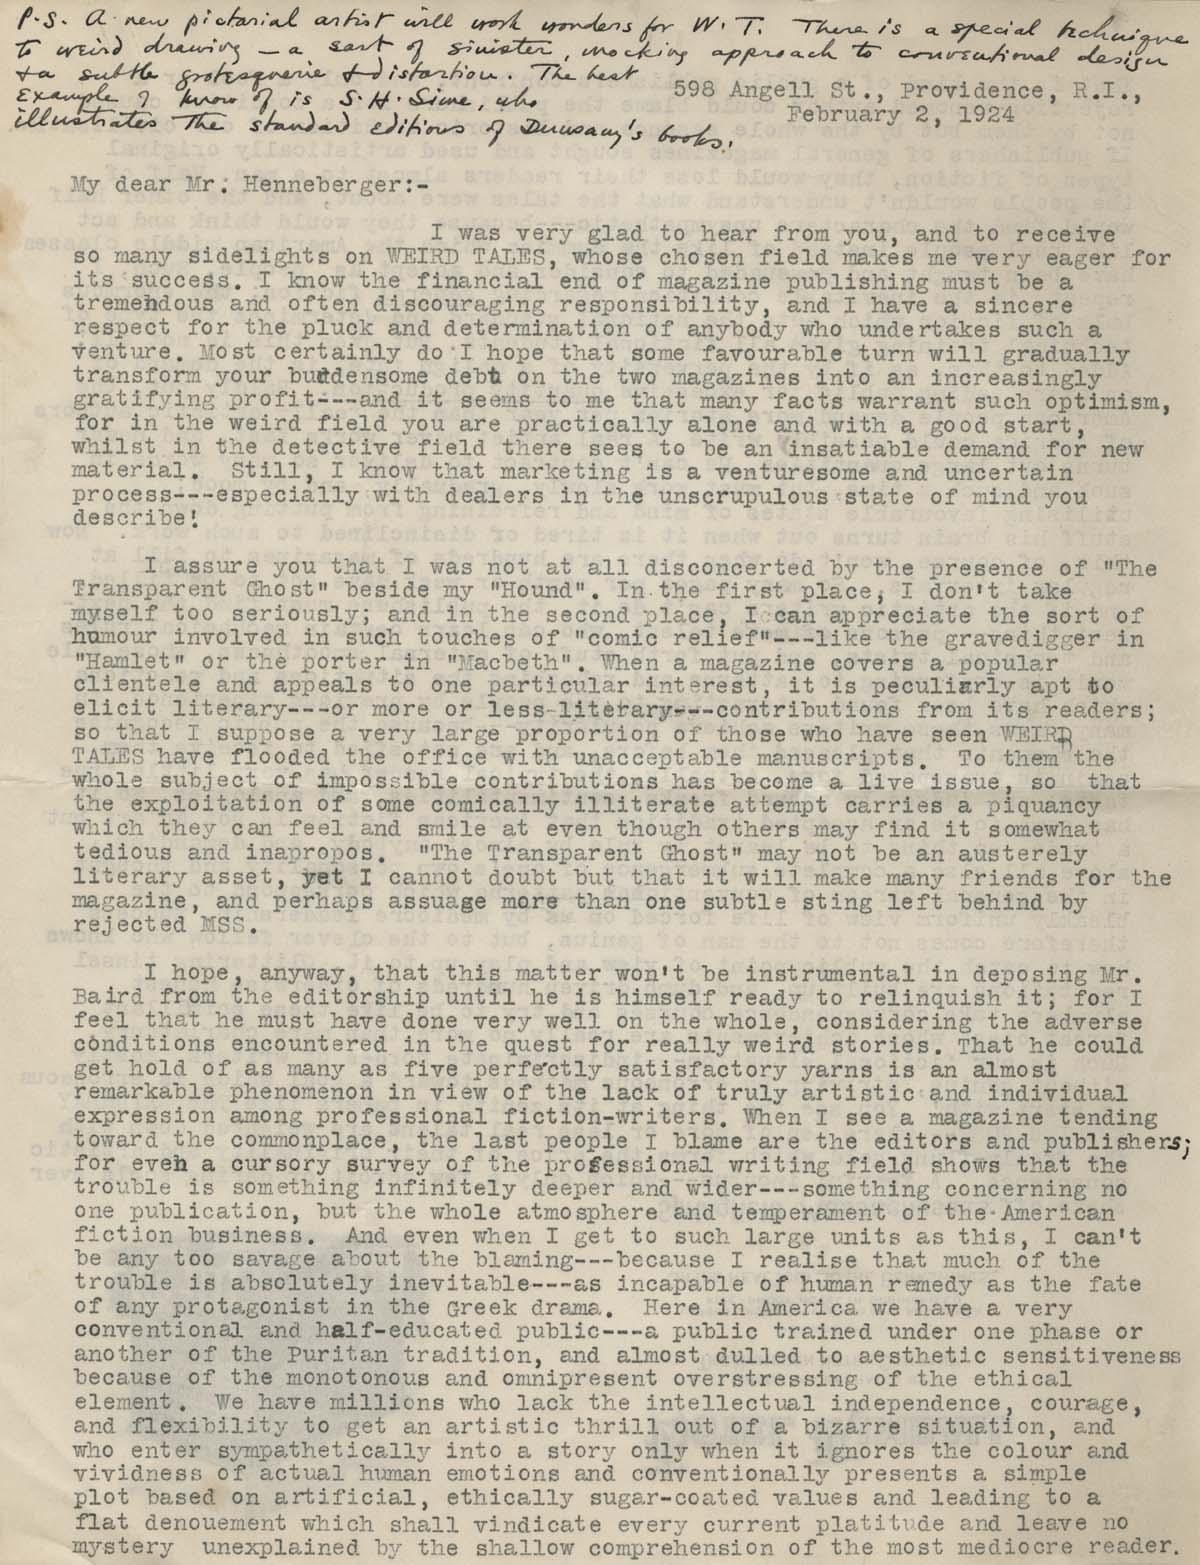 LovecraftHP_Letters_HennebergerJC_003